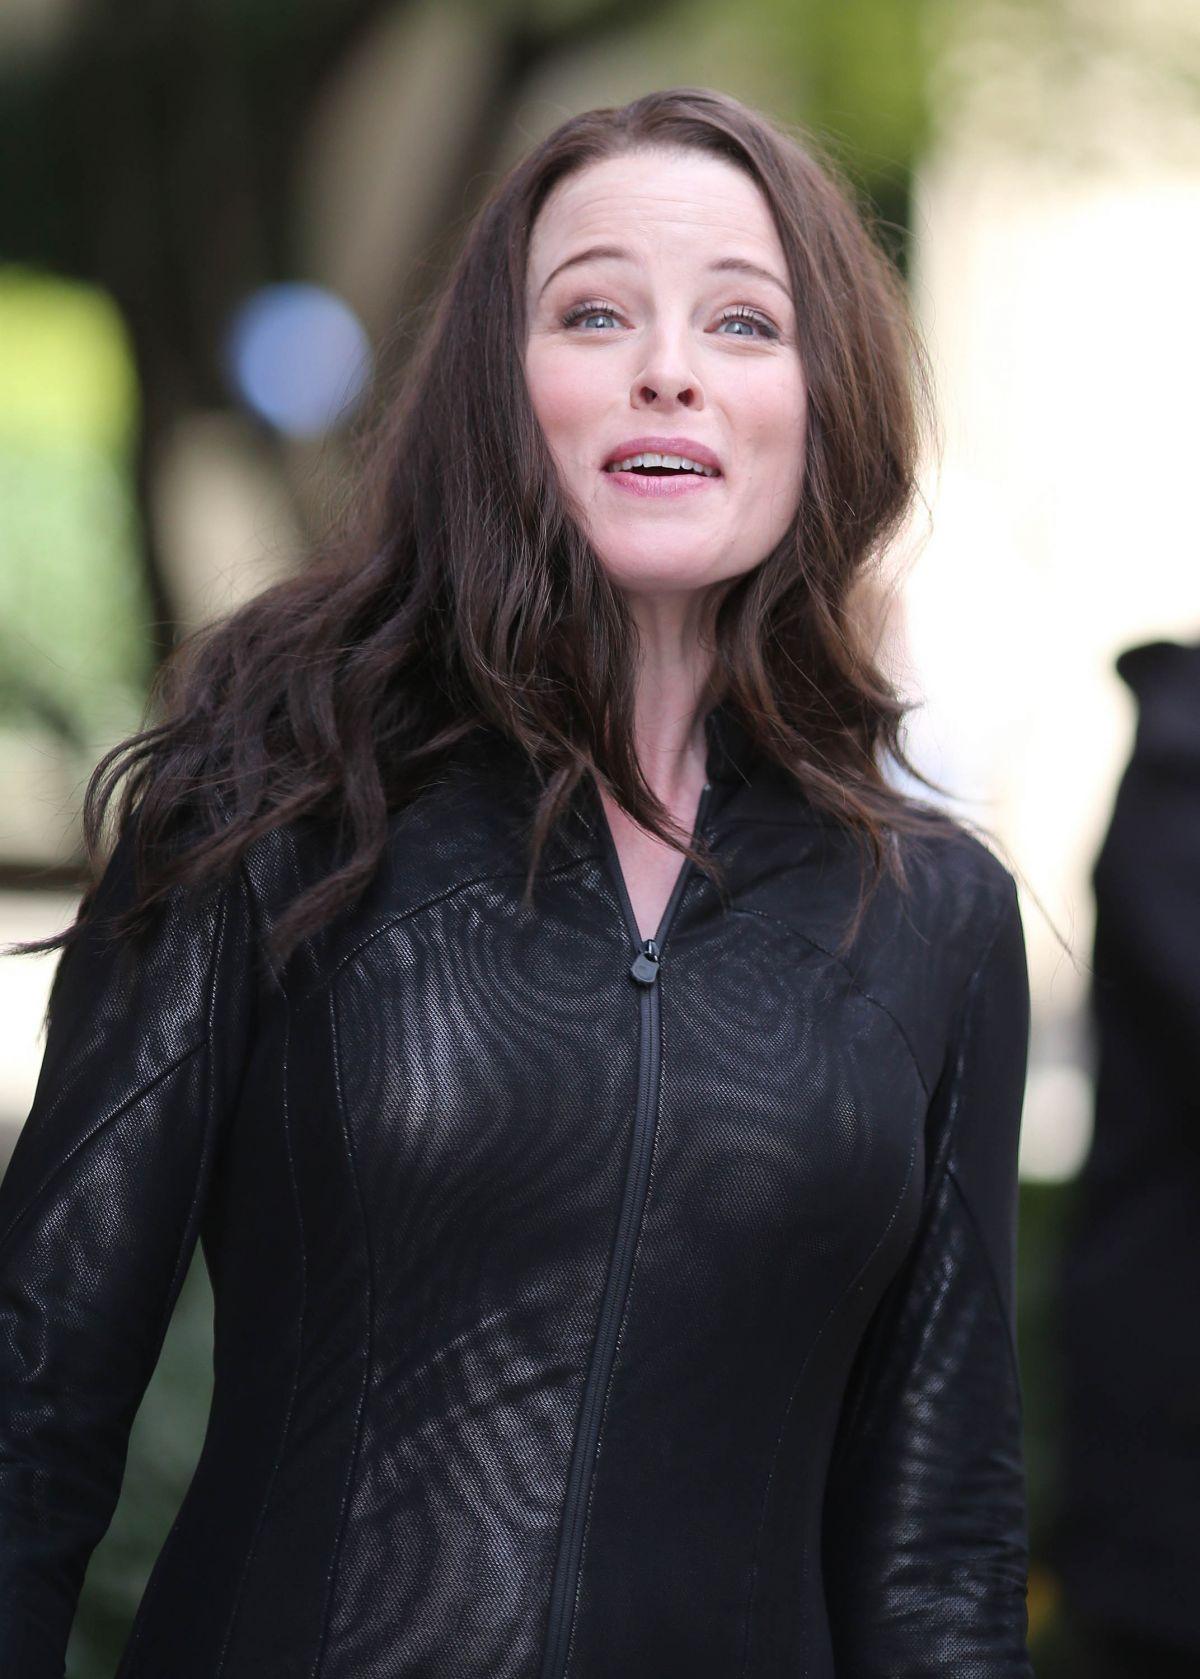 images Rachel Nichols (actress)